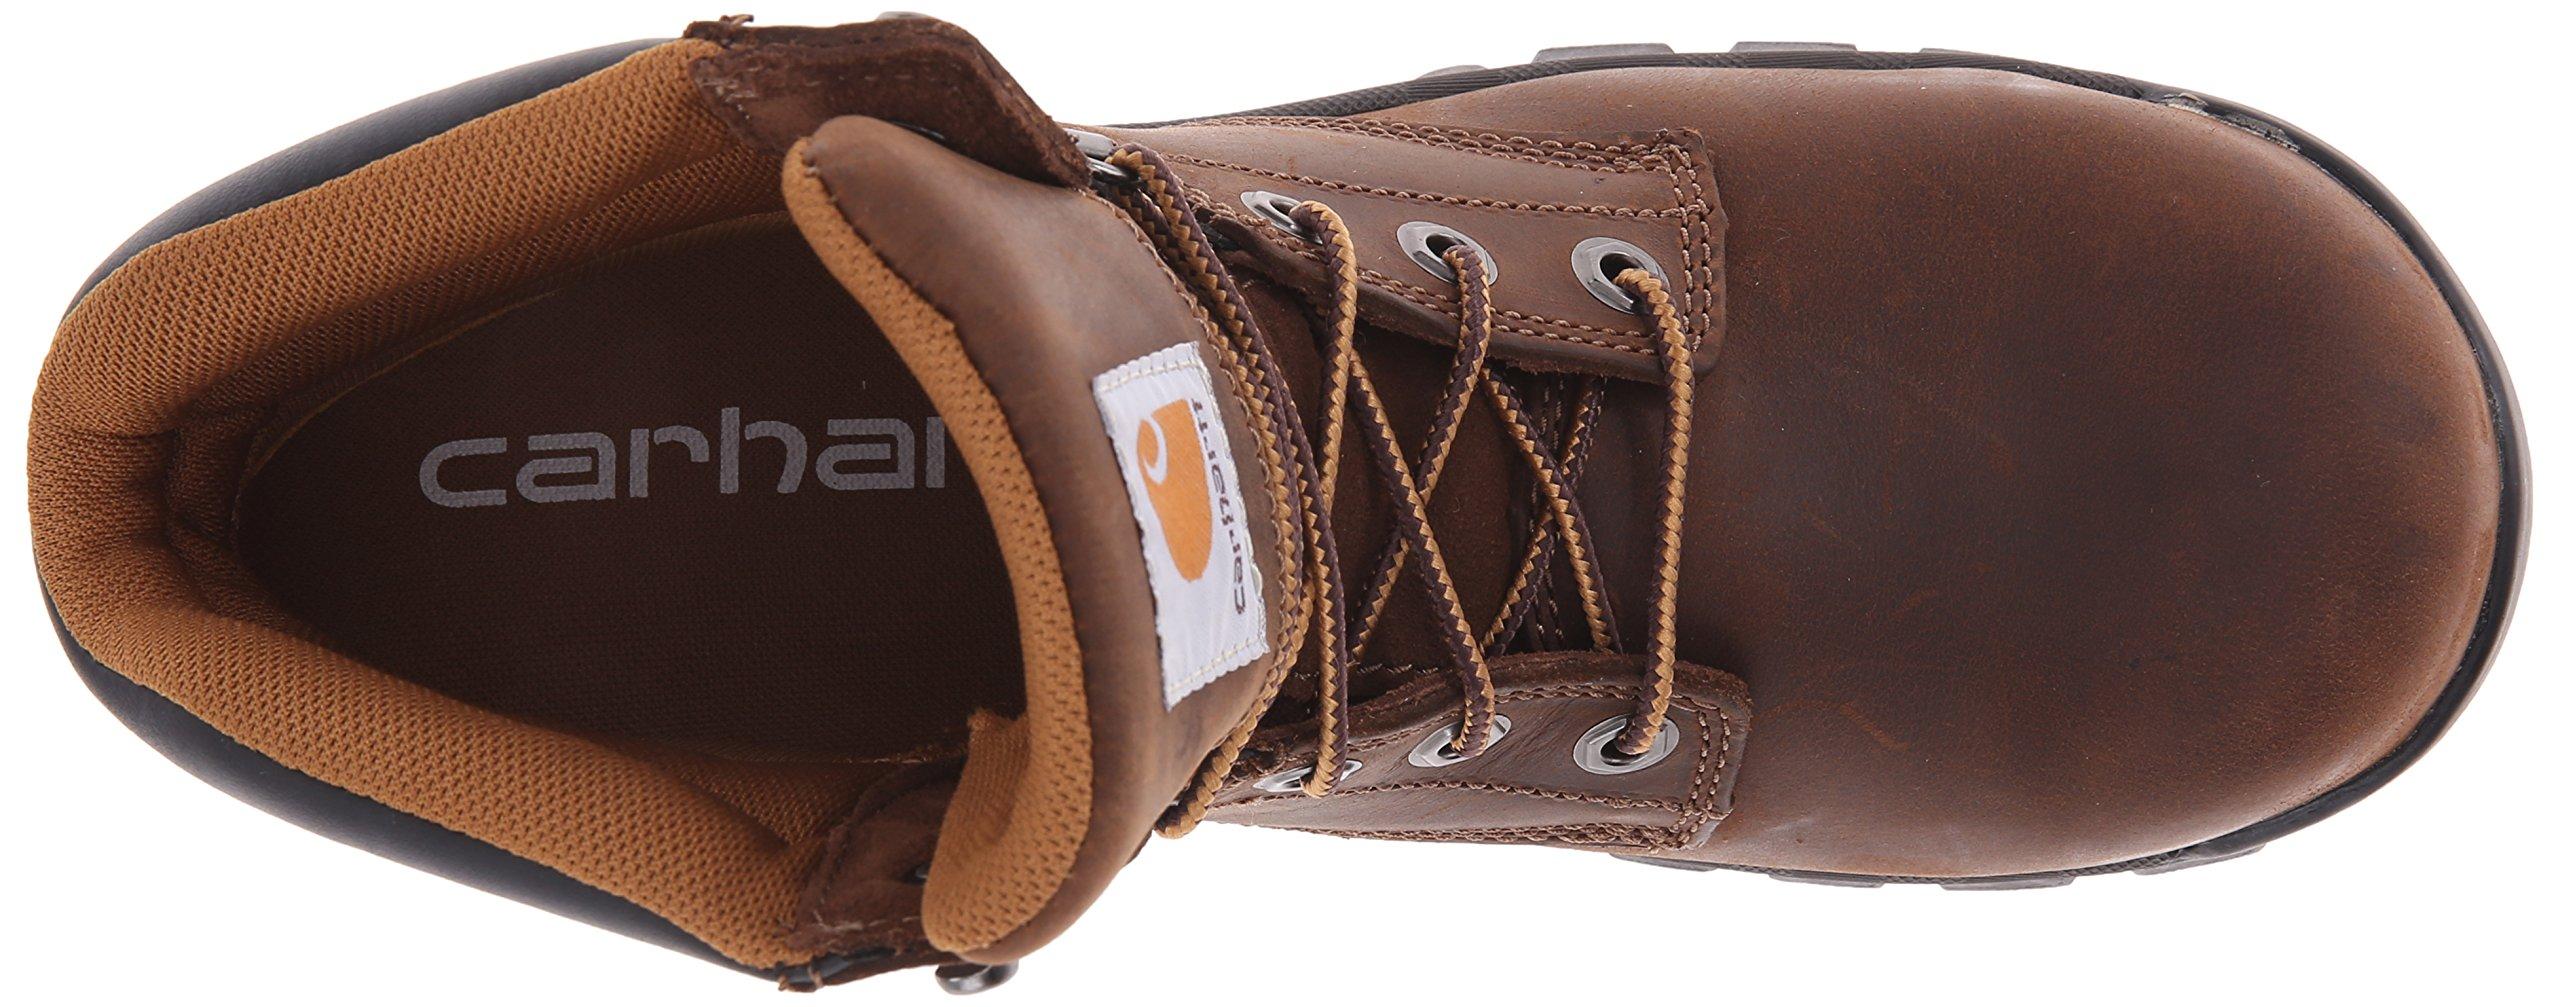 Carhartt Women's Rugged Flex 6 Inch Comp Toe CWF5355 Work Boot